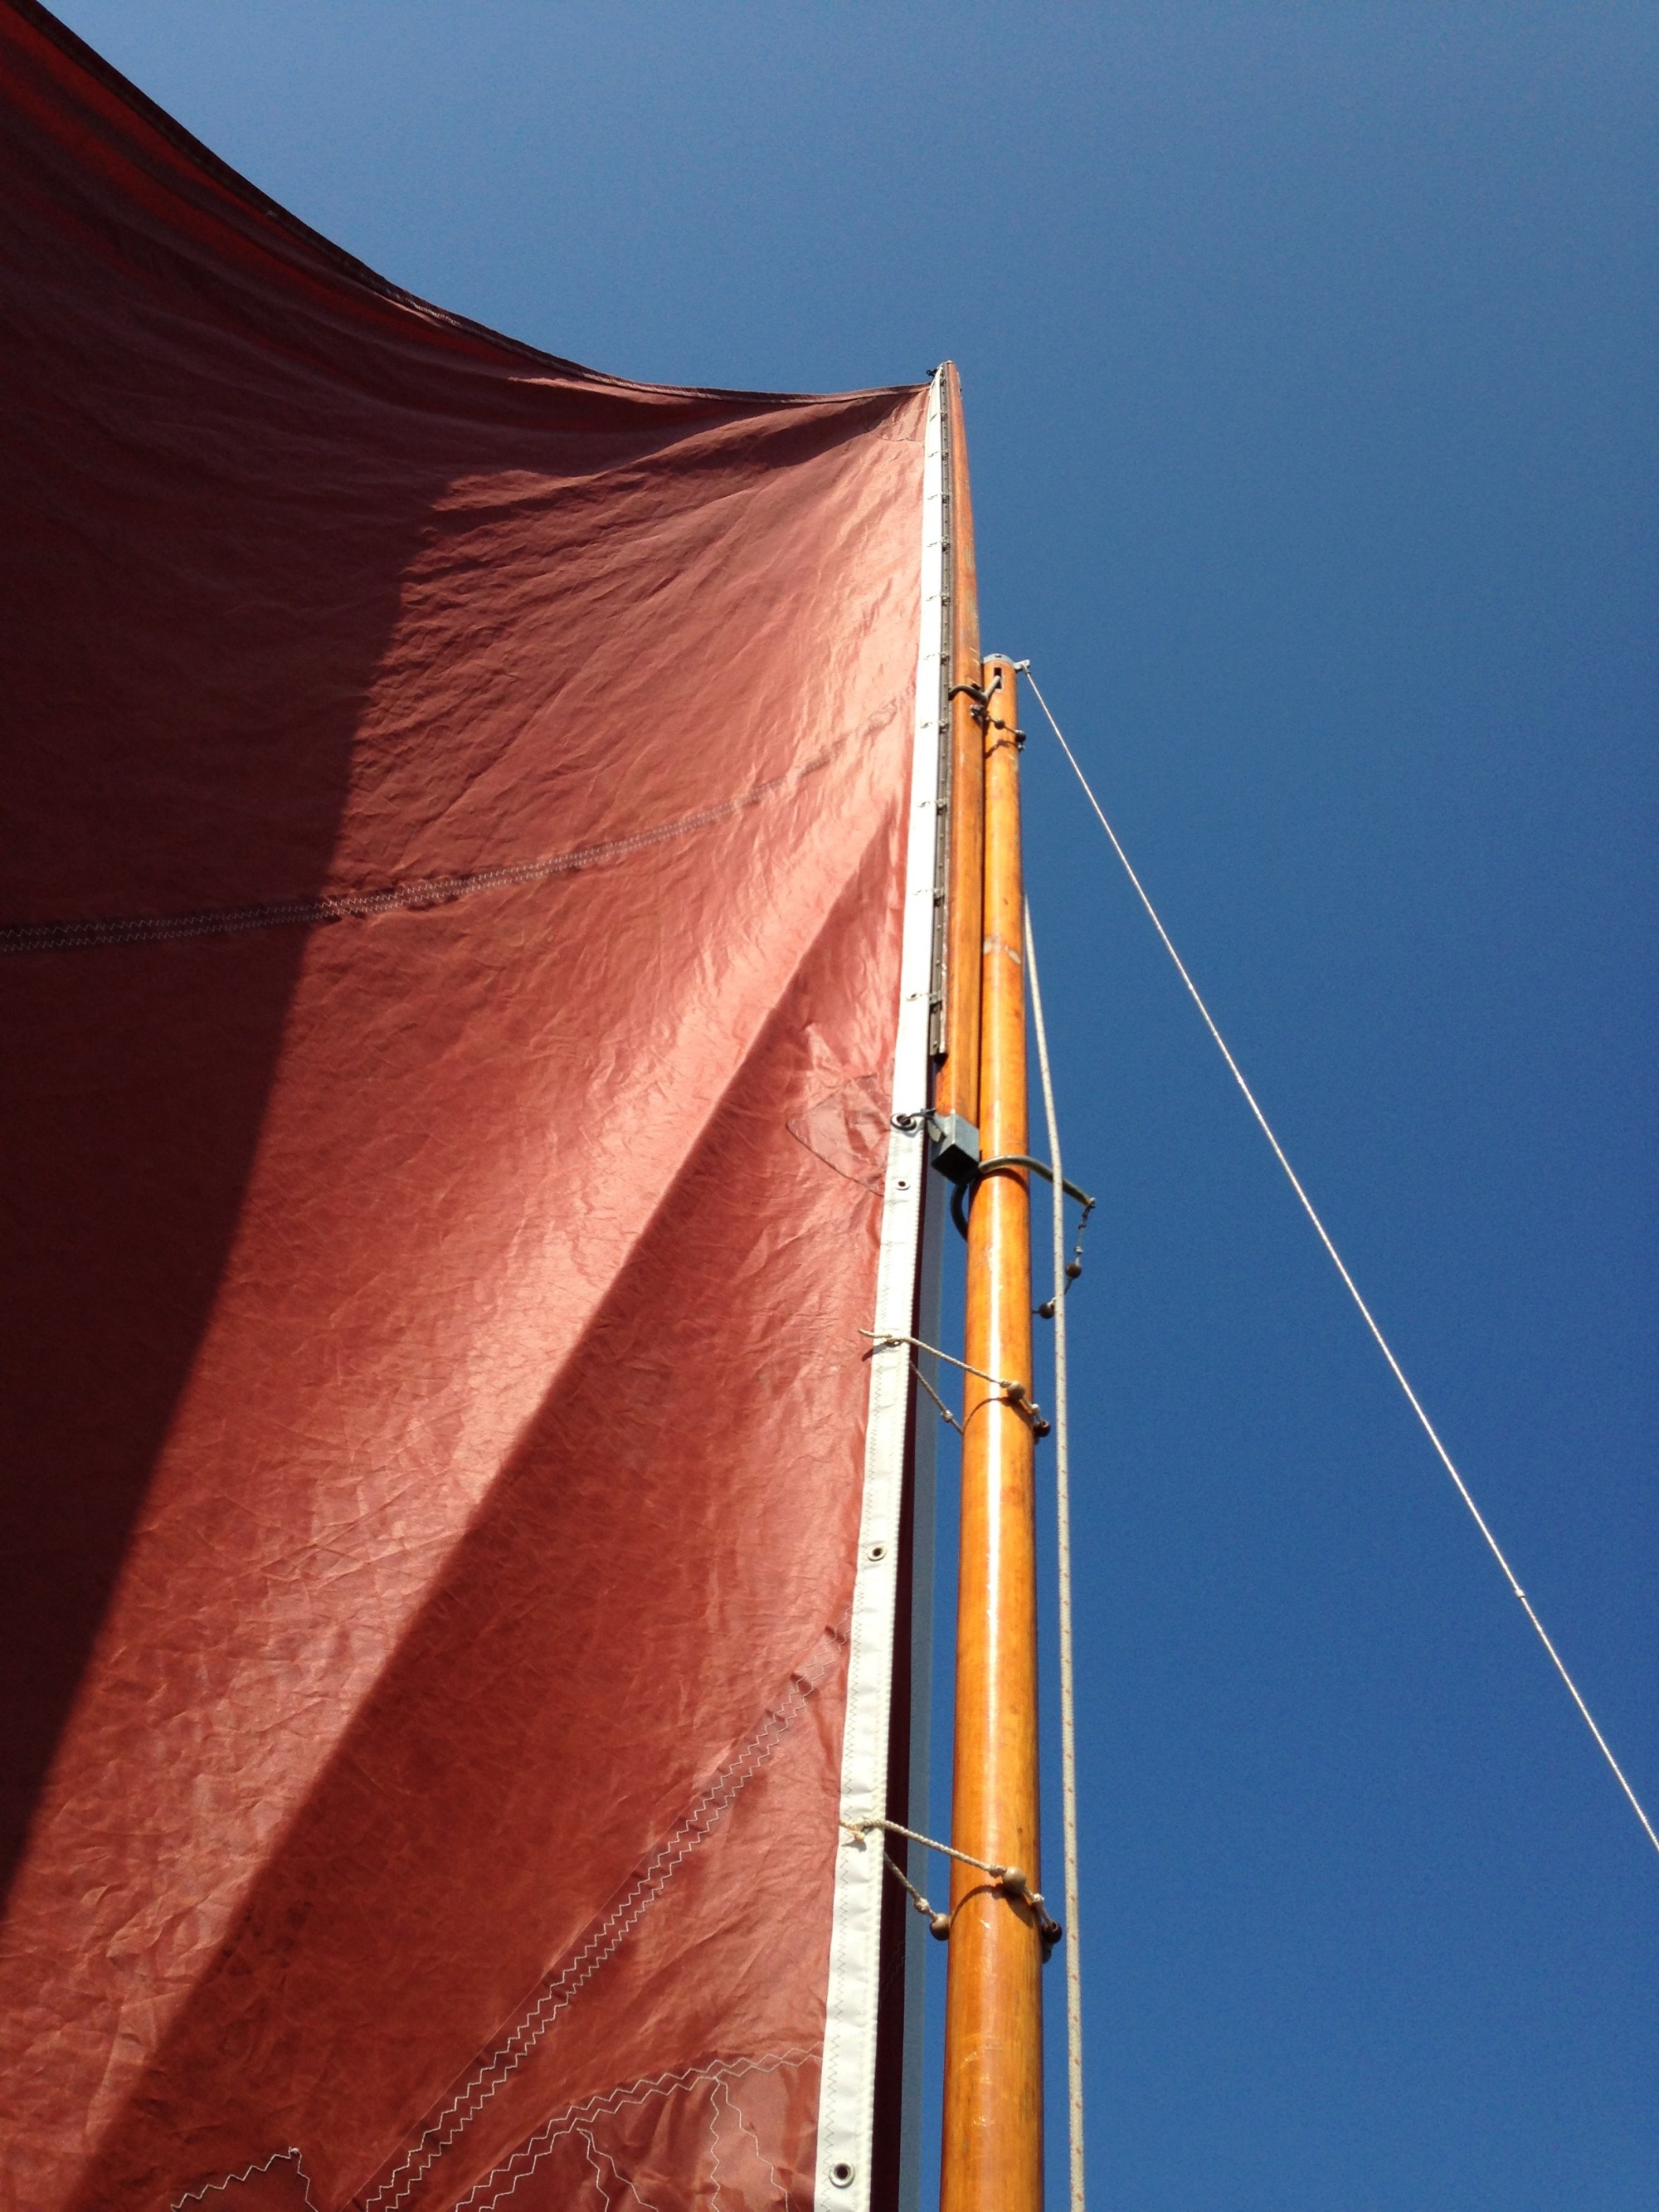 hight resolution of sliding gunter sail rig on drascombe lugger onkahye